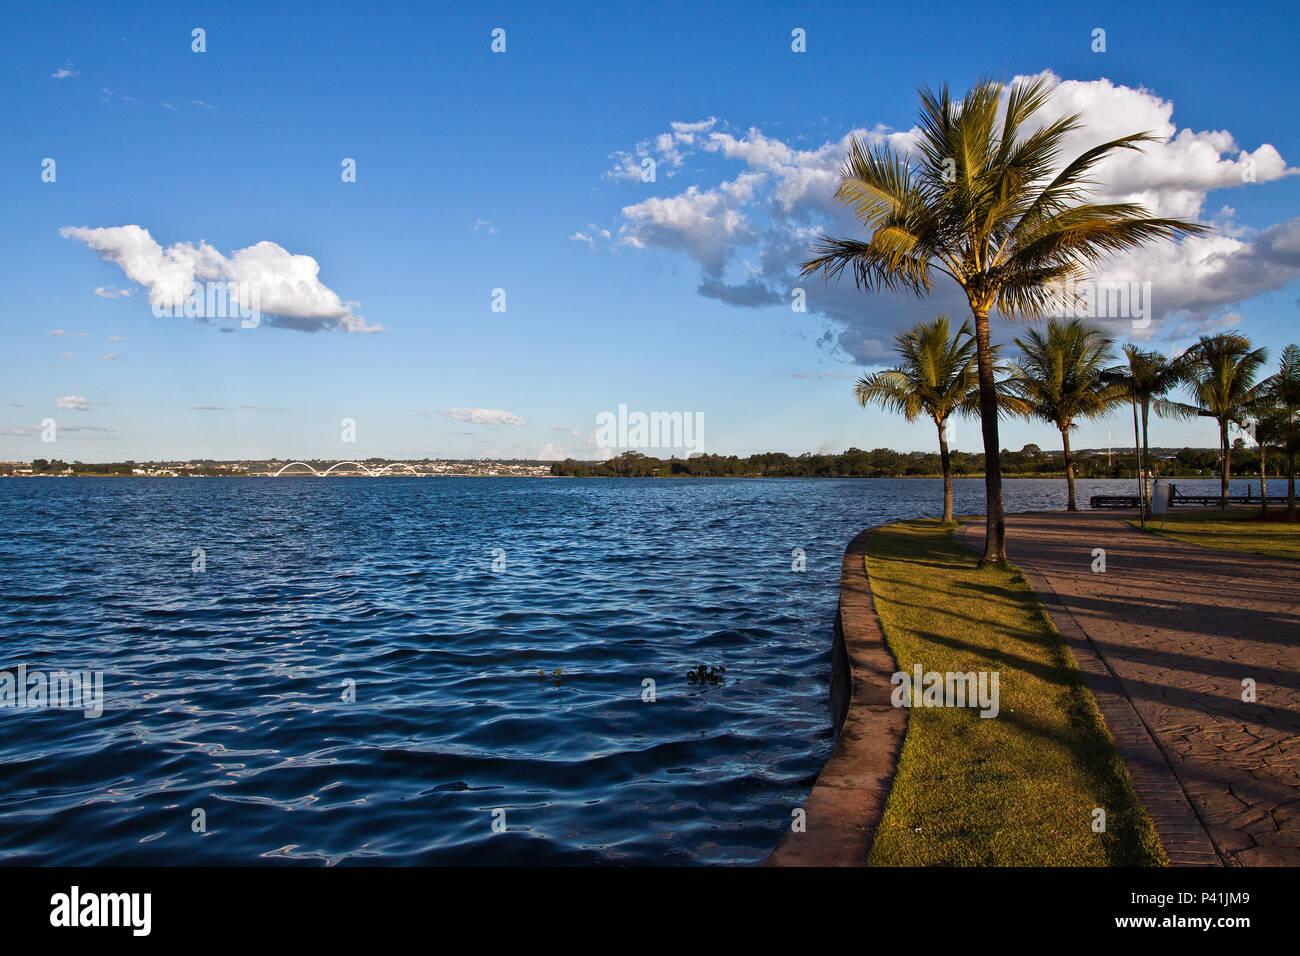 Brasília - DF lago Lago Paranoá lago artificial de Brasília Brasília Centro Oeste Brasil Distrito Federal - Stock Image